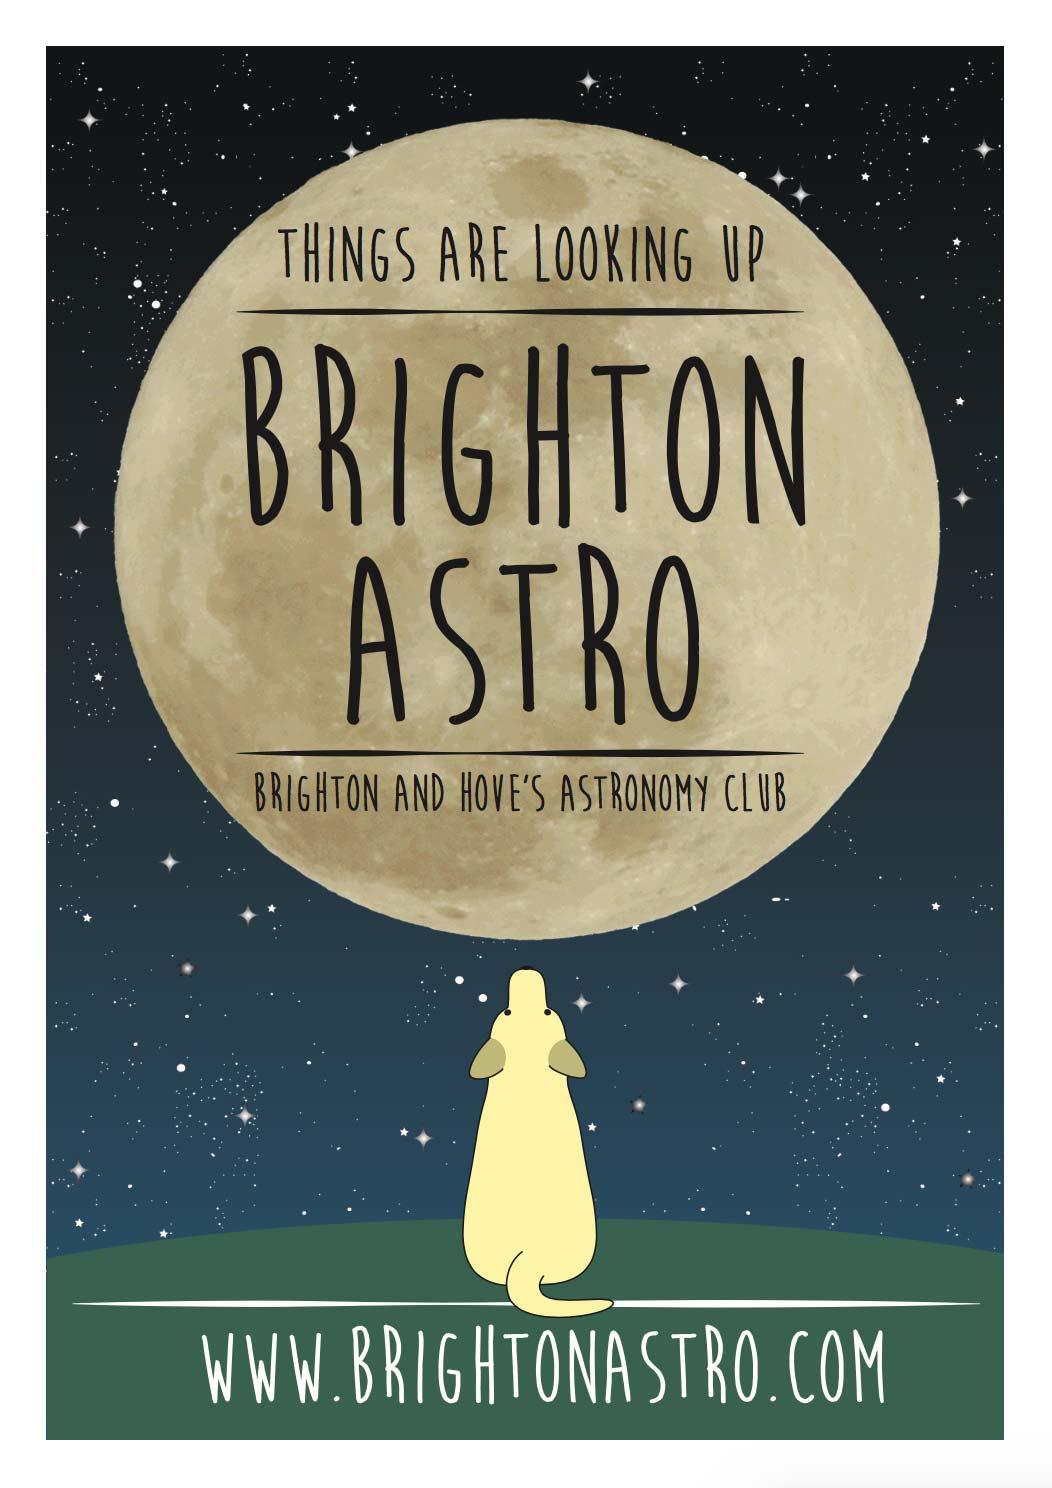 Brighton Astro